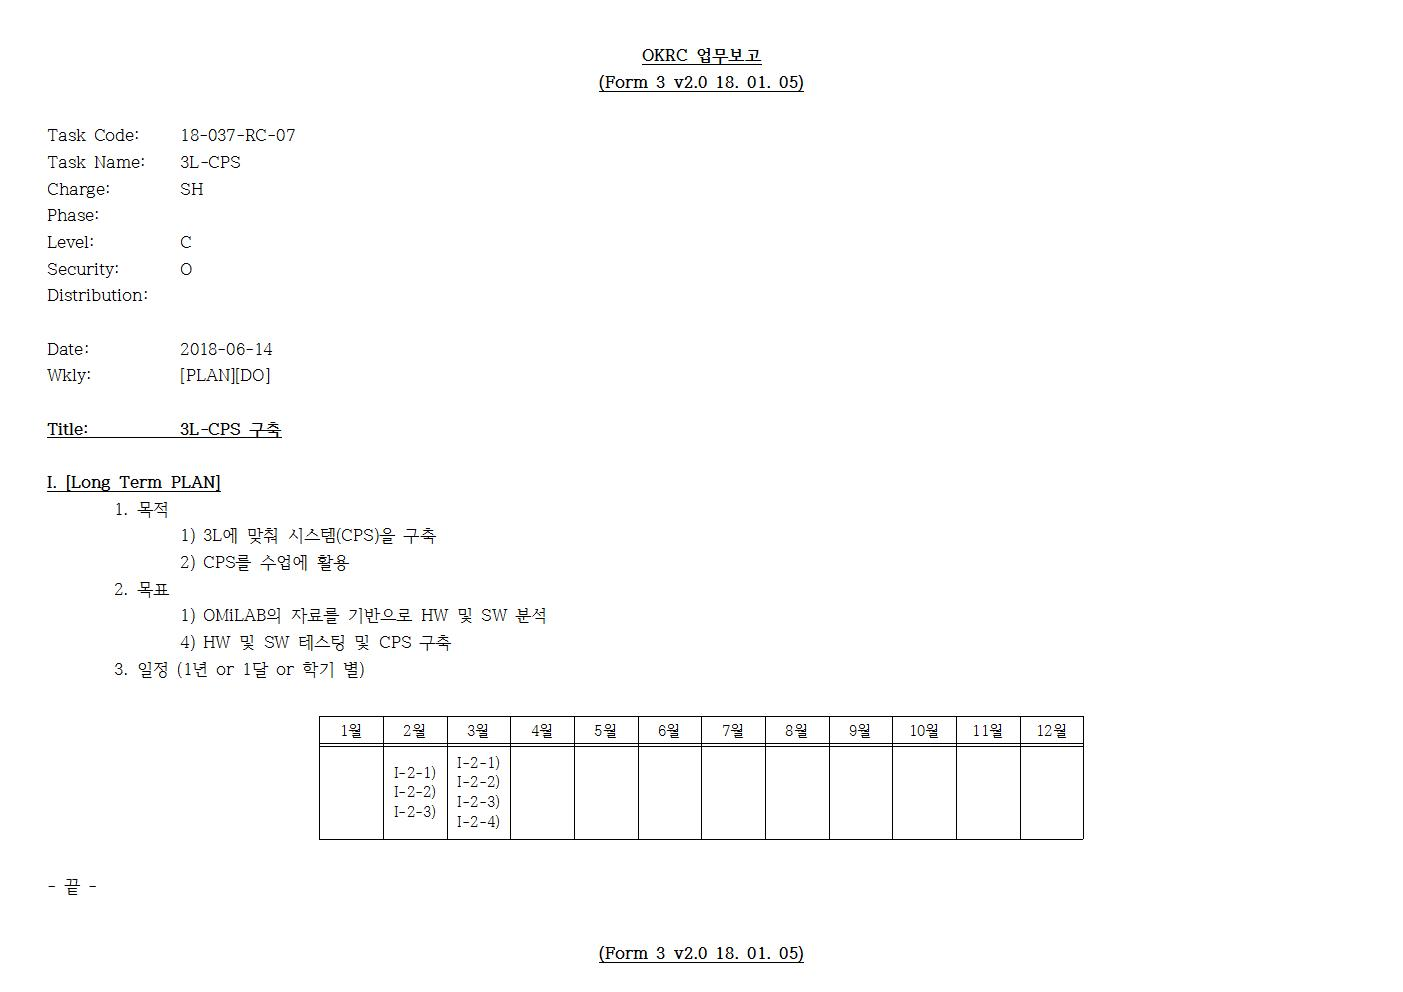 D-[18-037-RC-07]-[3L-CPS]-[2018-06-14][SH]001.jpg